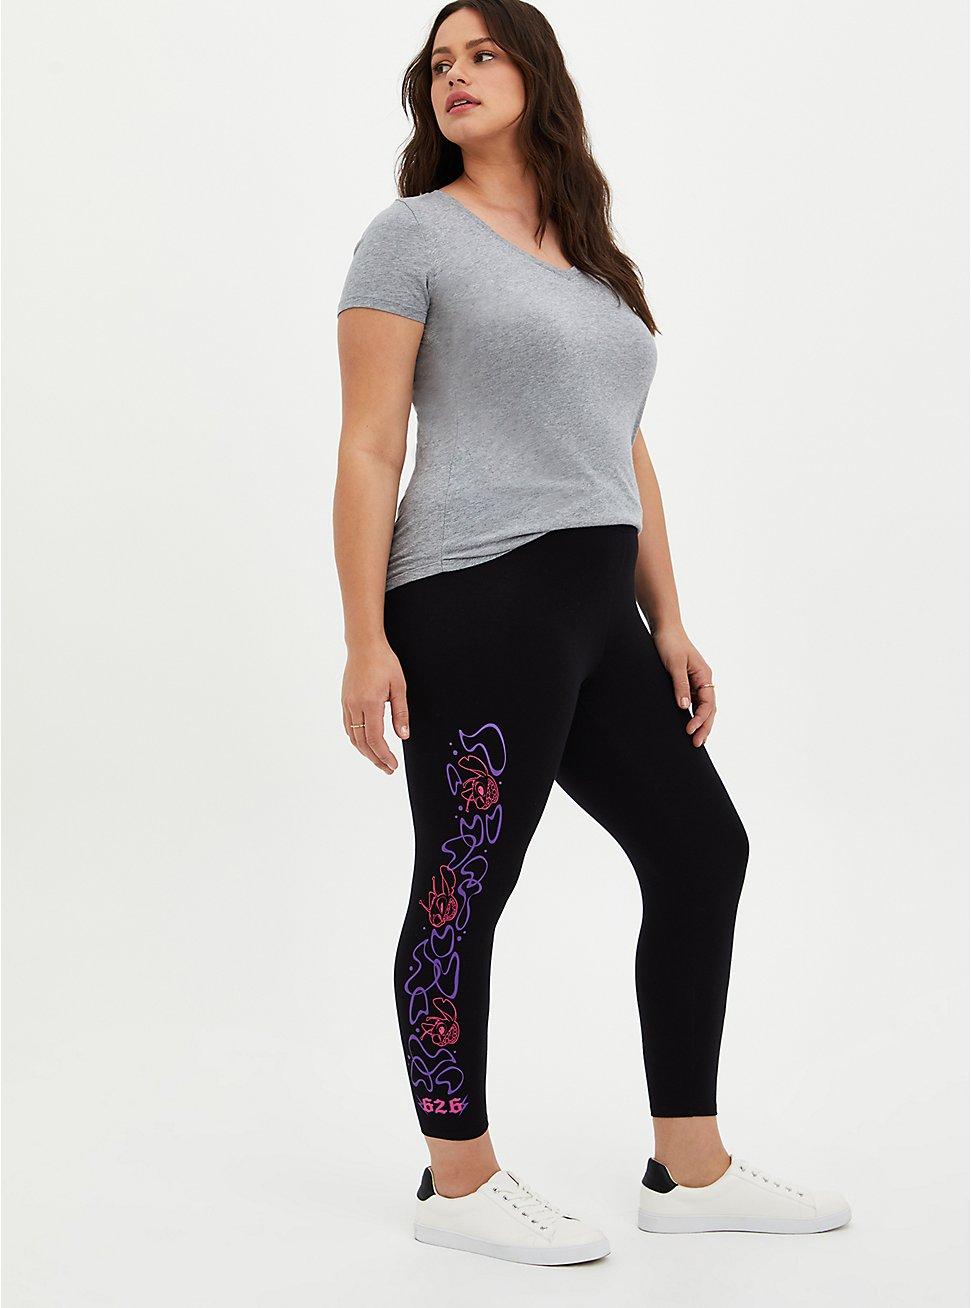 Disney Lilo & Stitch Crop Legging, DEEP BLACK, hi-res